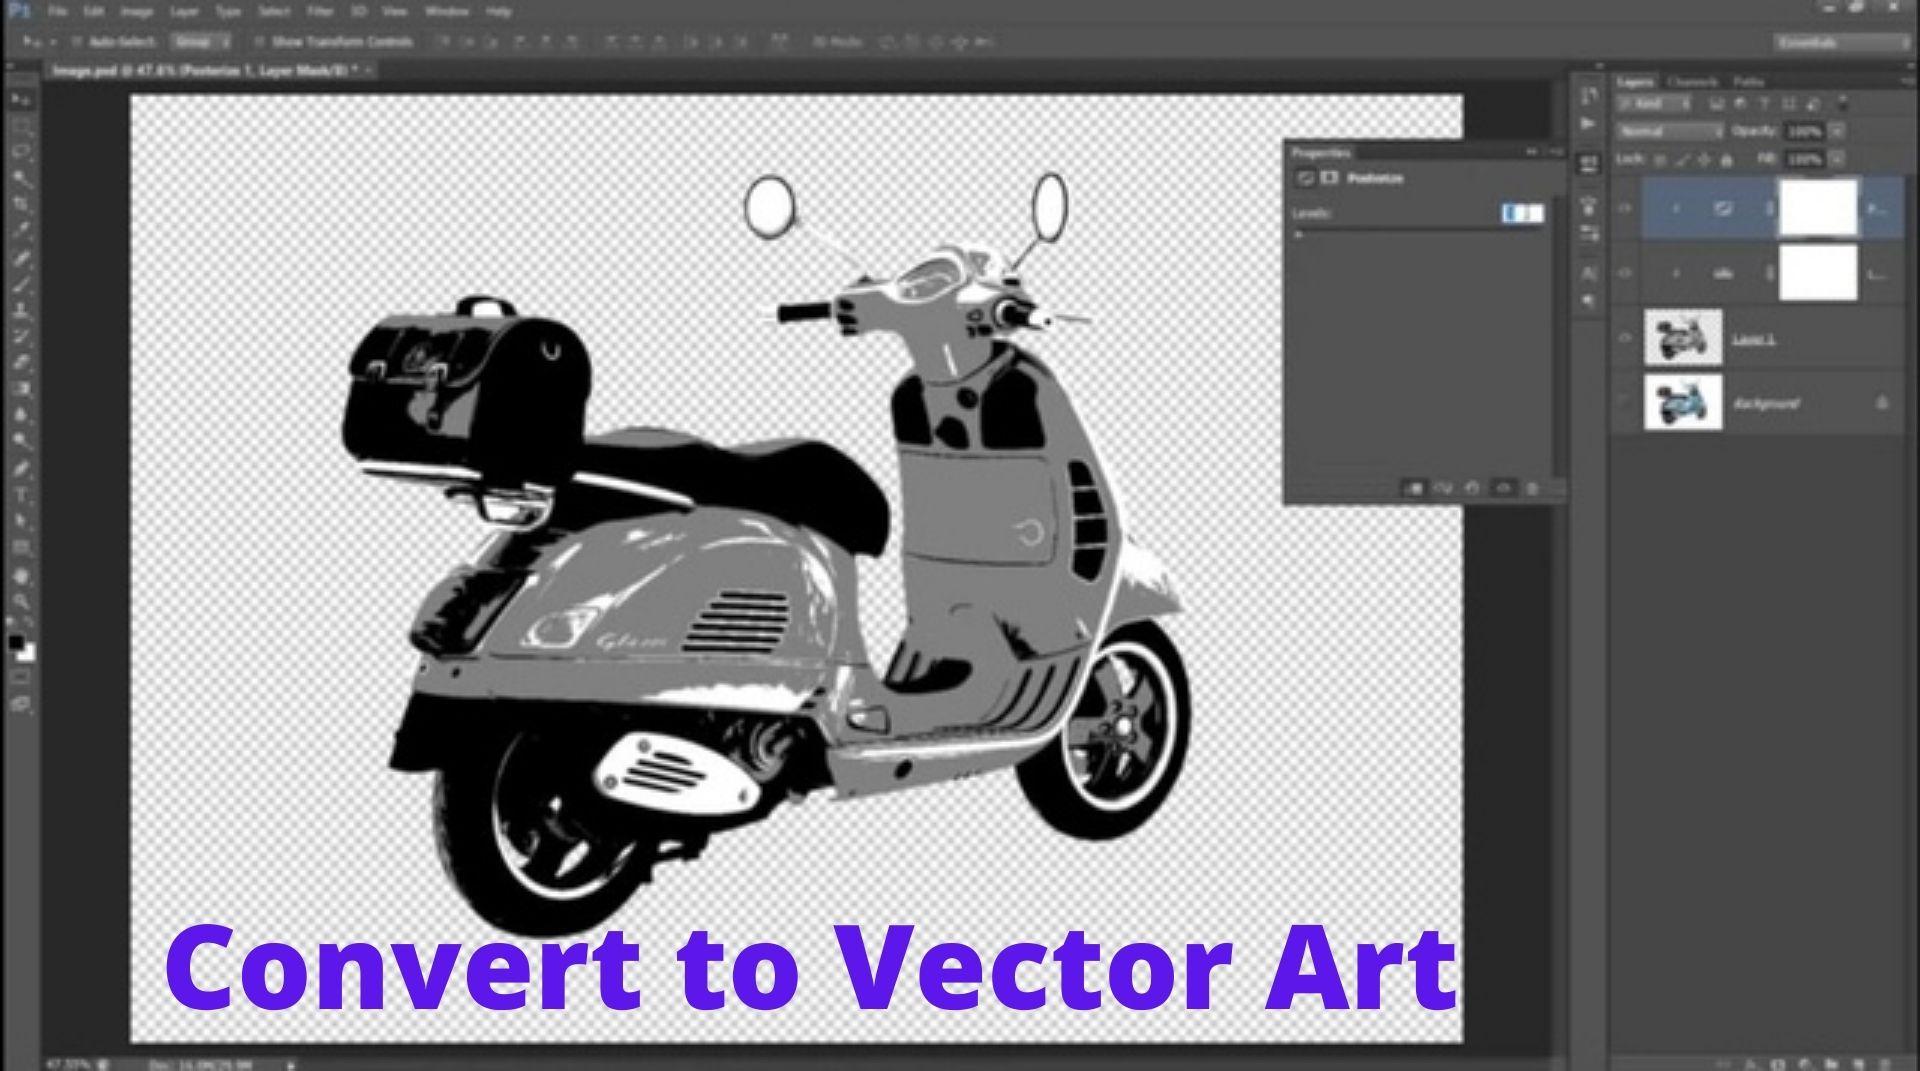 Convert to Vector Art